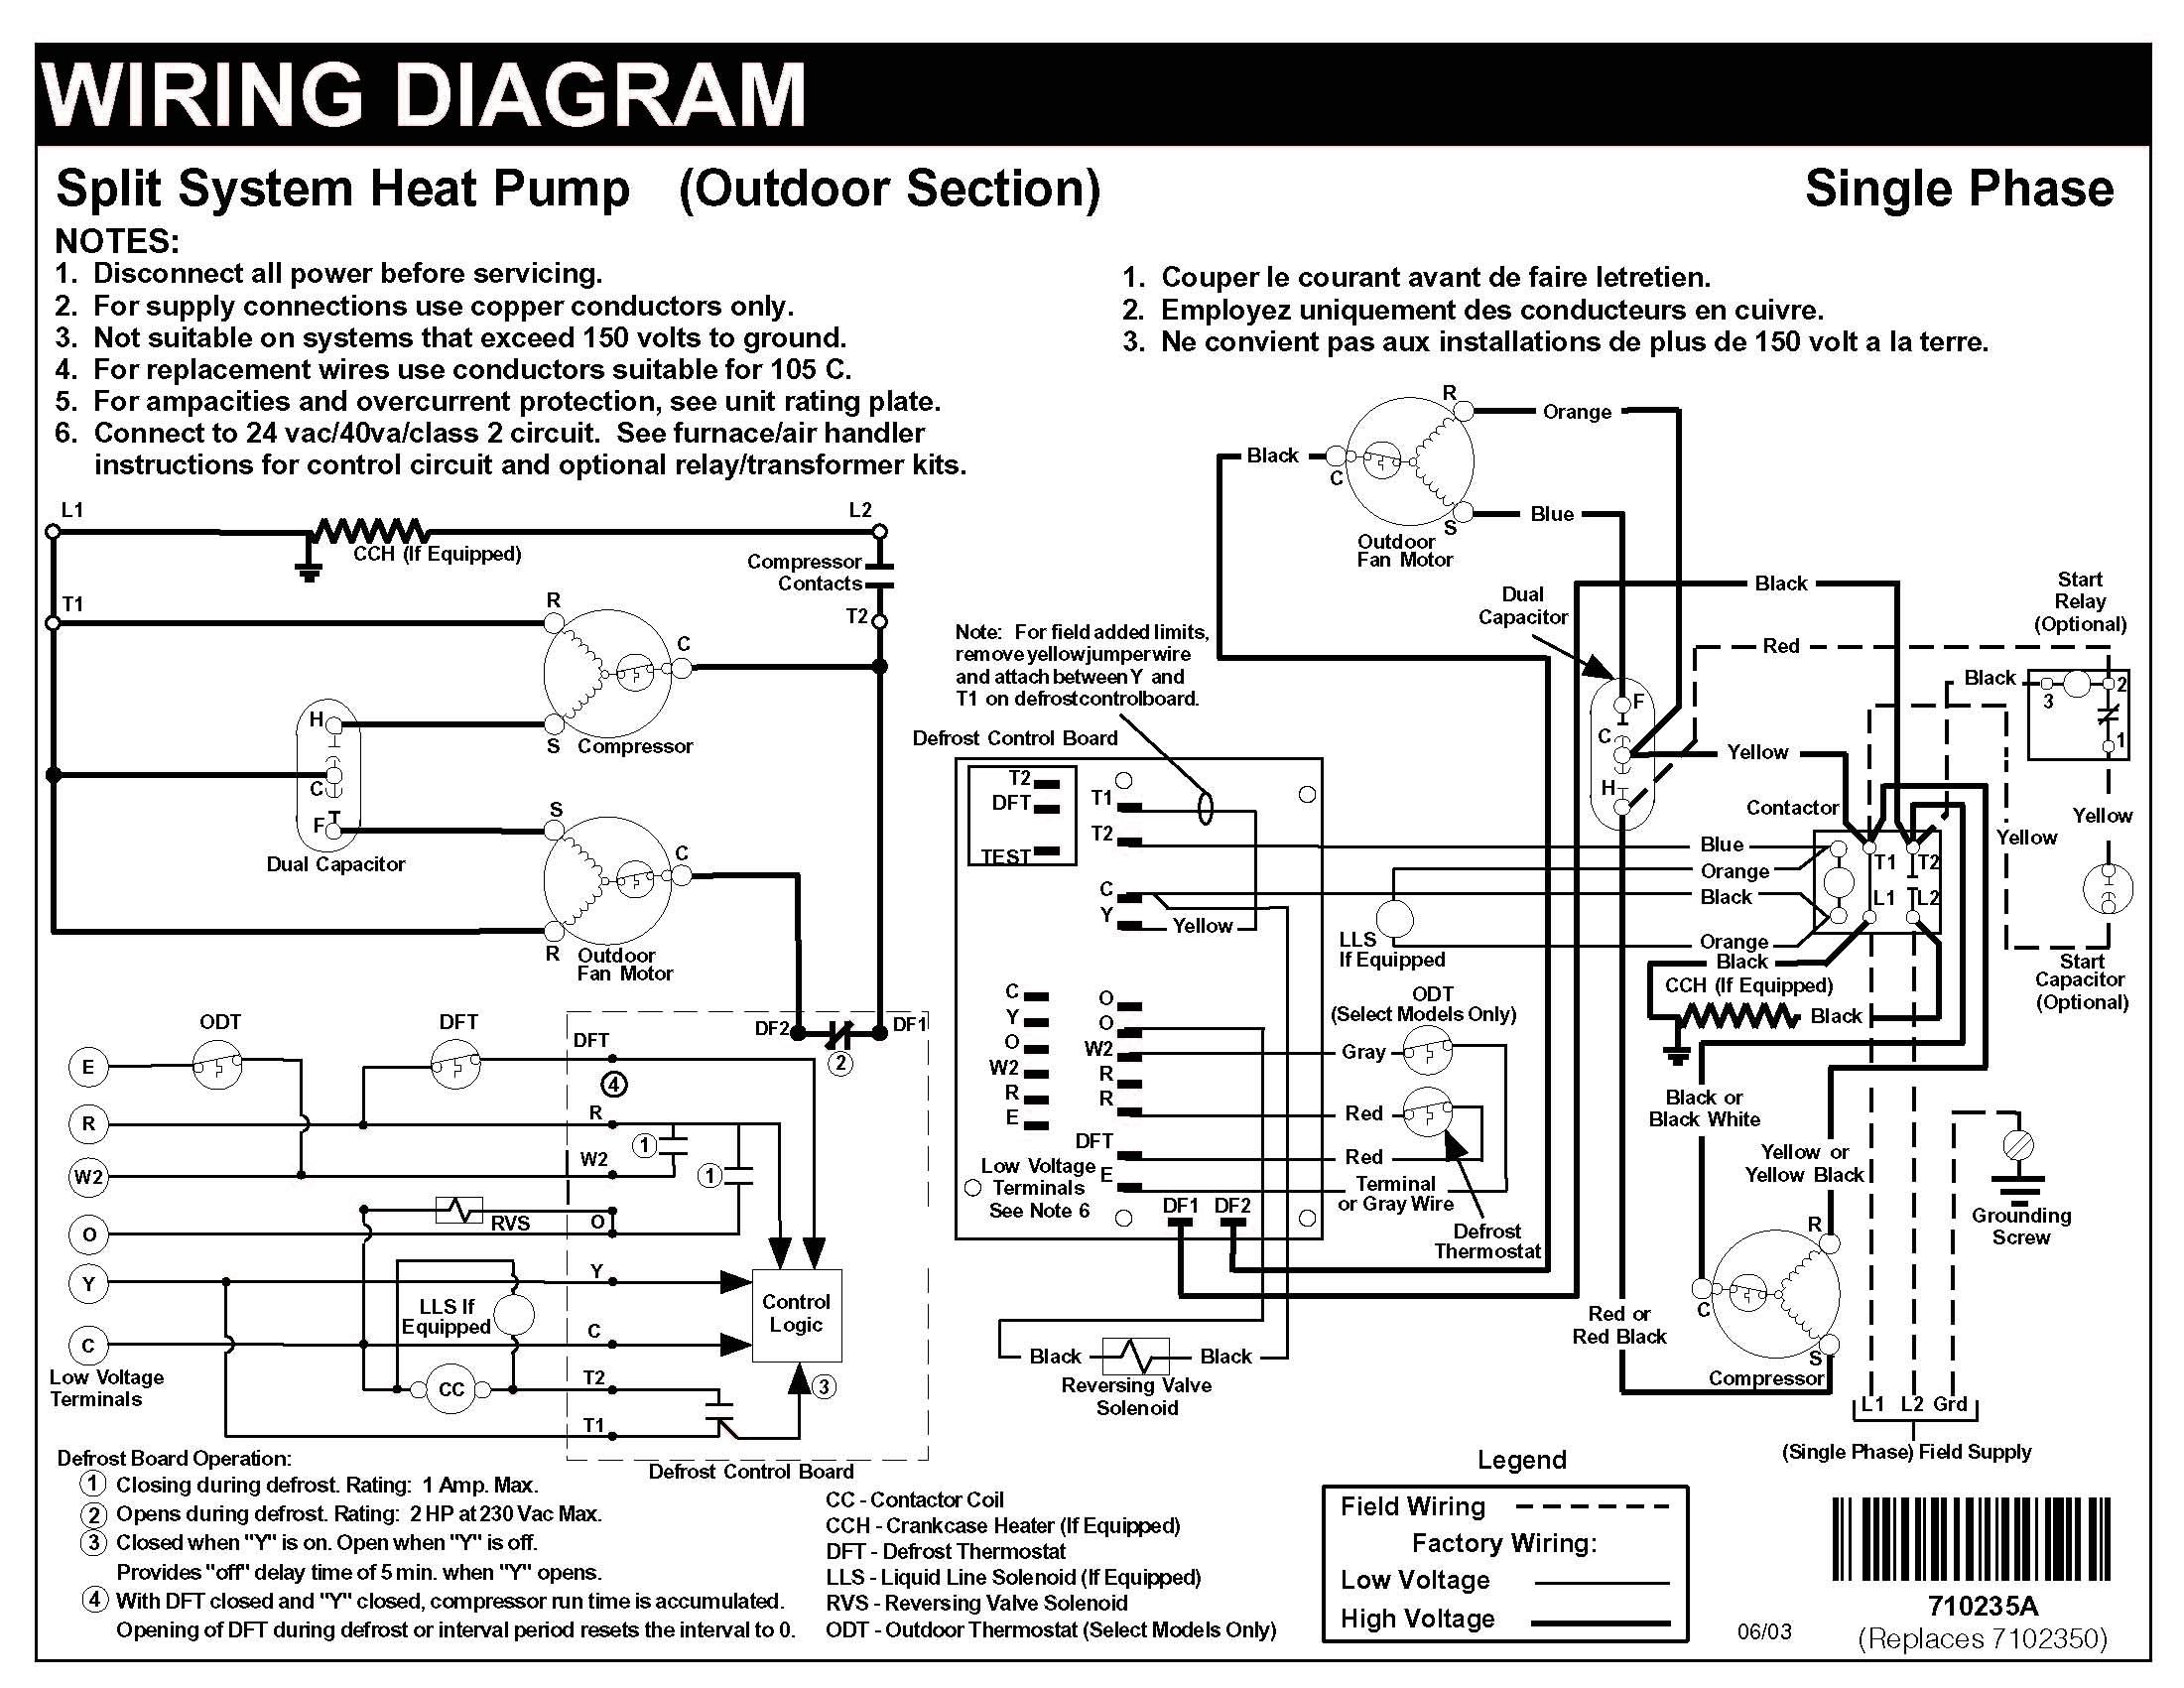 Swell Goodman 3 Ton Heat Pump Wiring Diagram 13 Seer Heat Pumps Wiring Wiring Cloud Inklaidewilluminateatxorg